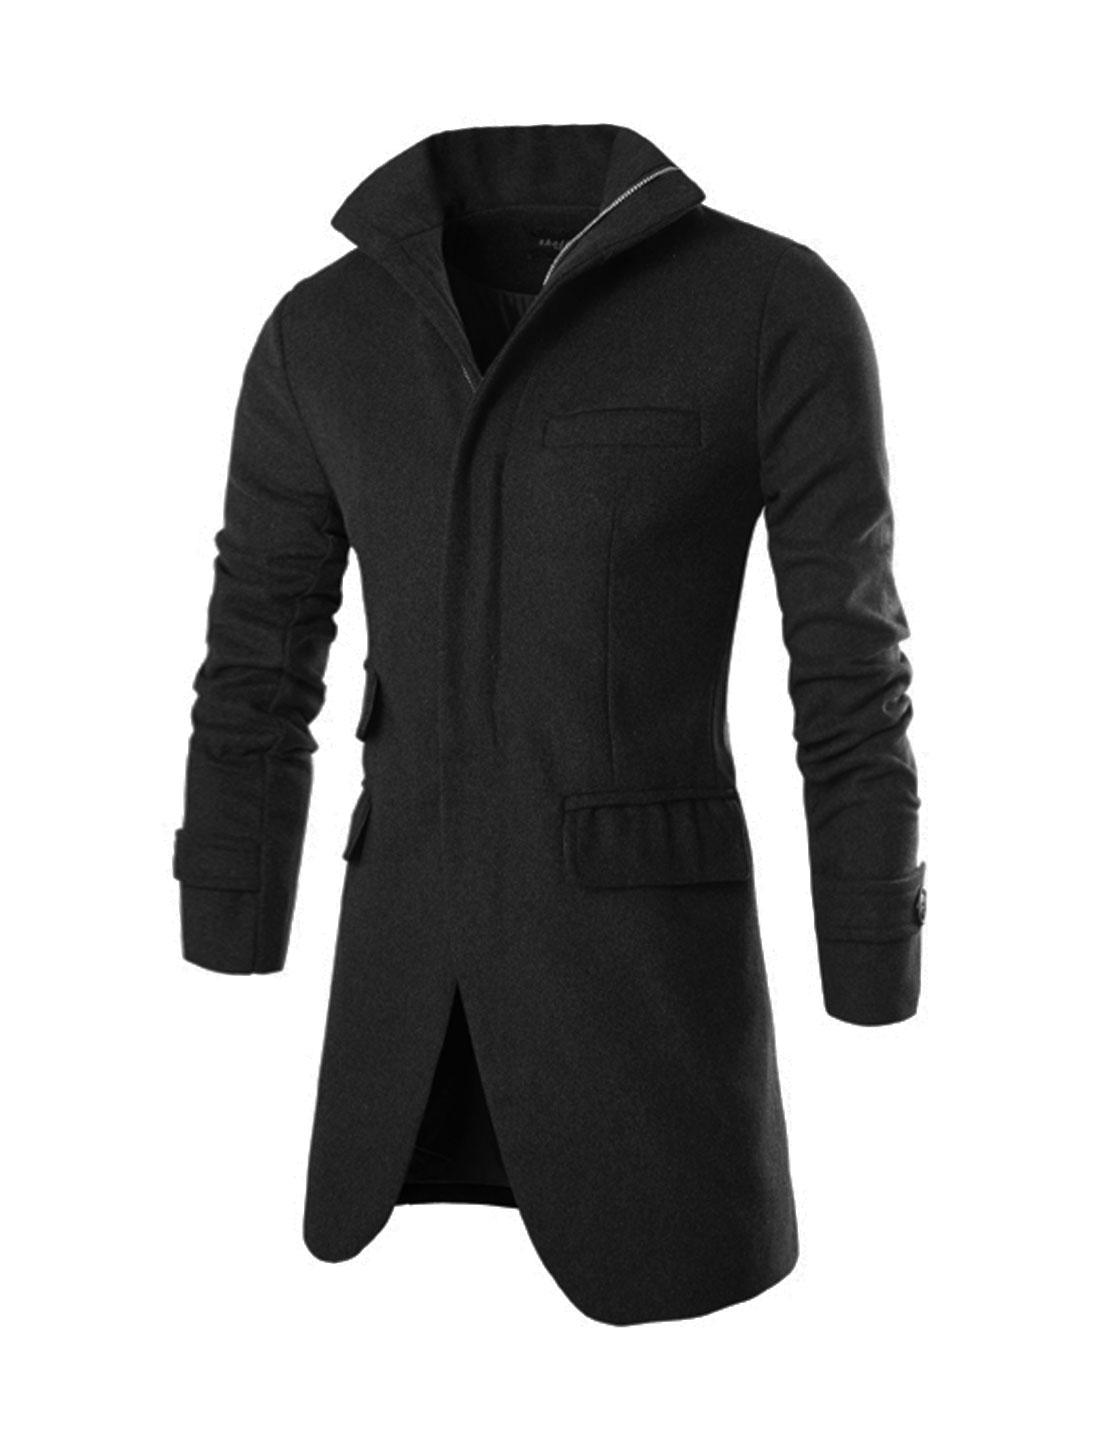 Men Hidden Placket Funnel Neck Tunic Worsted Coat Black M